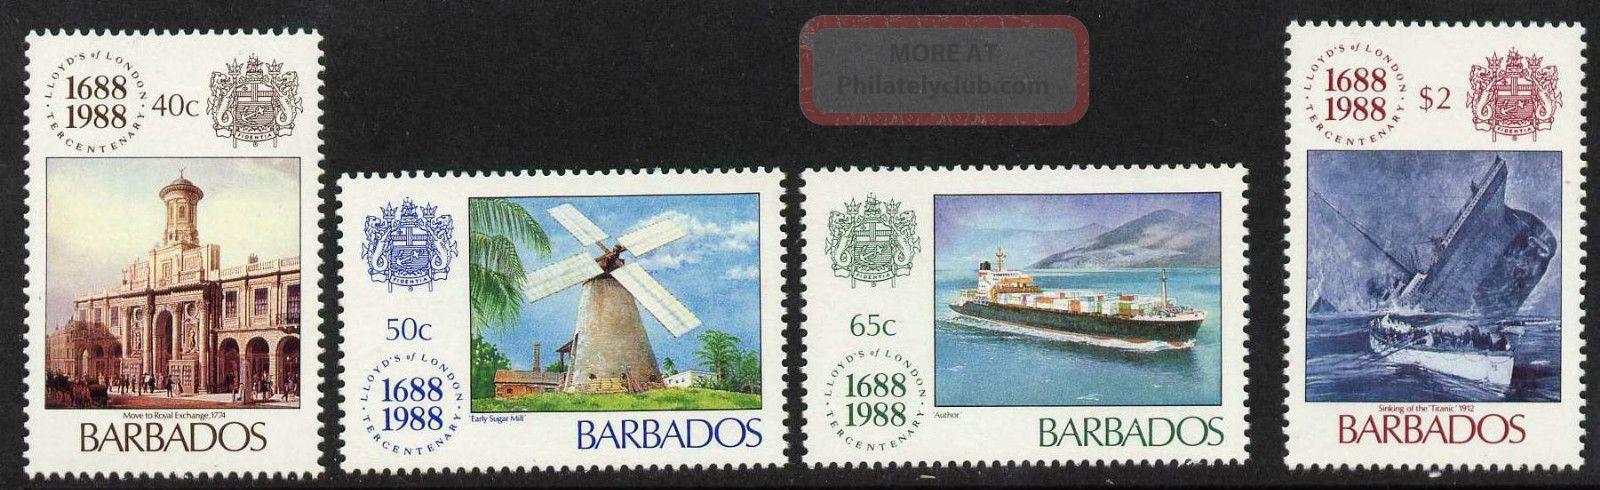 Barbados 731 - 4 Ships,  Lloyd ' S,  Architecture Caribbean photo